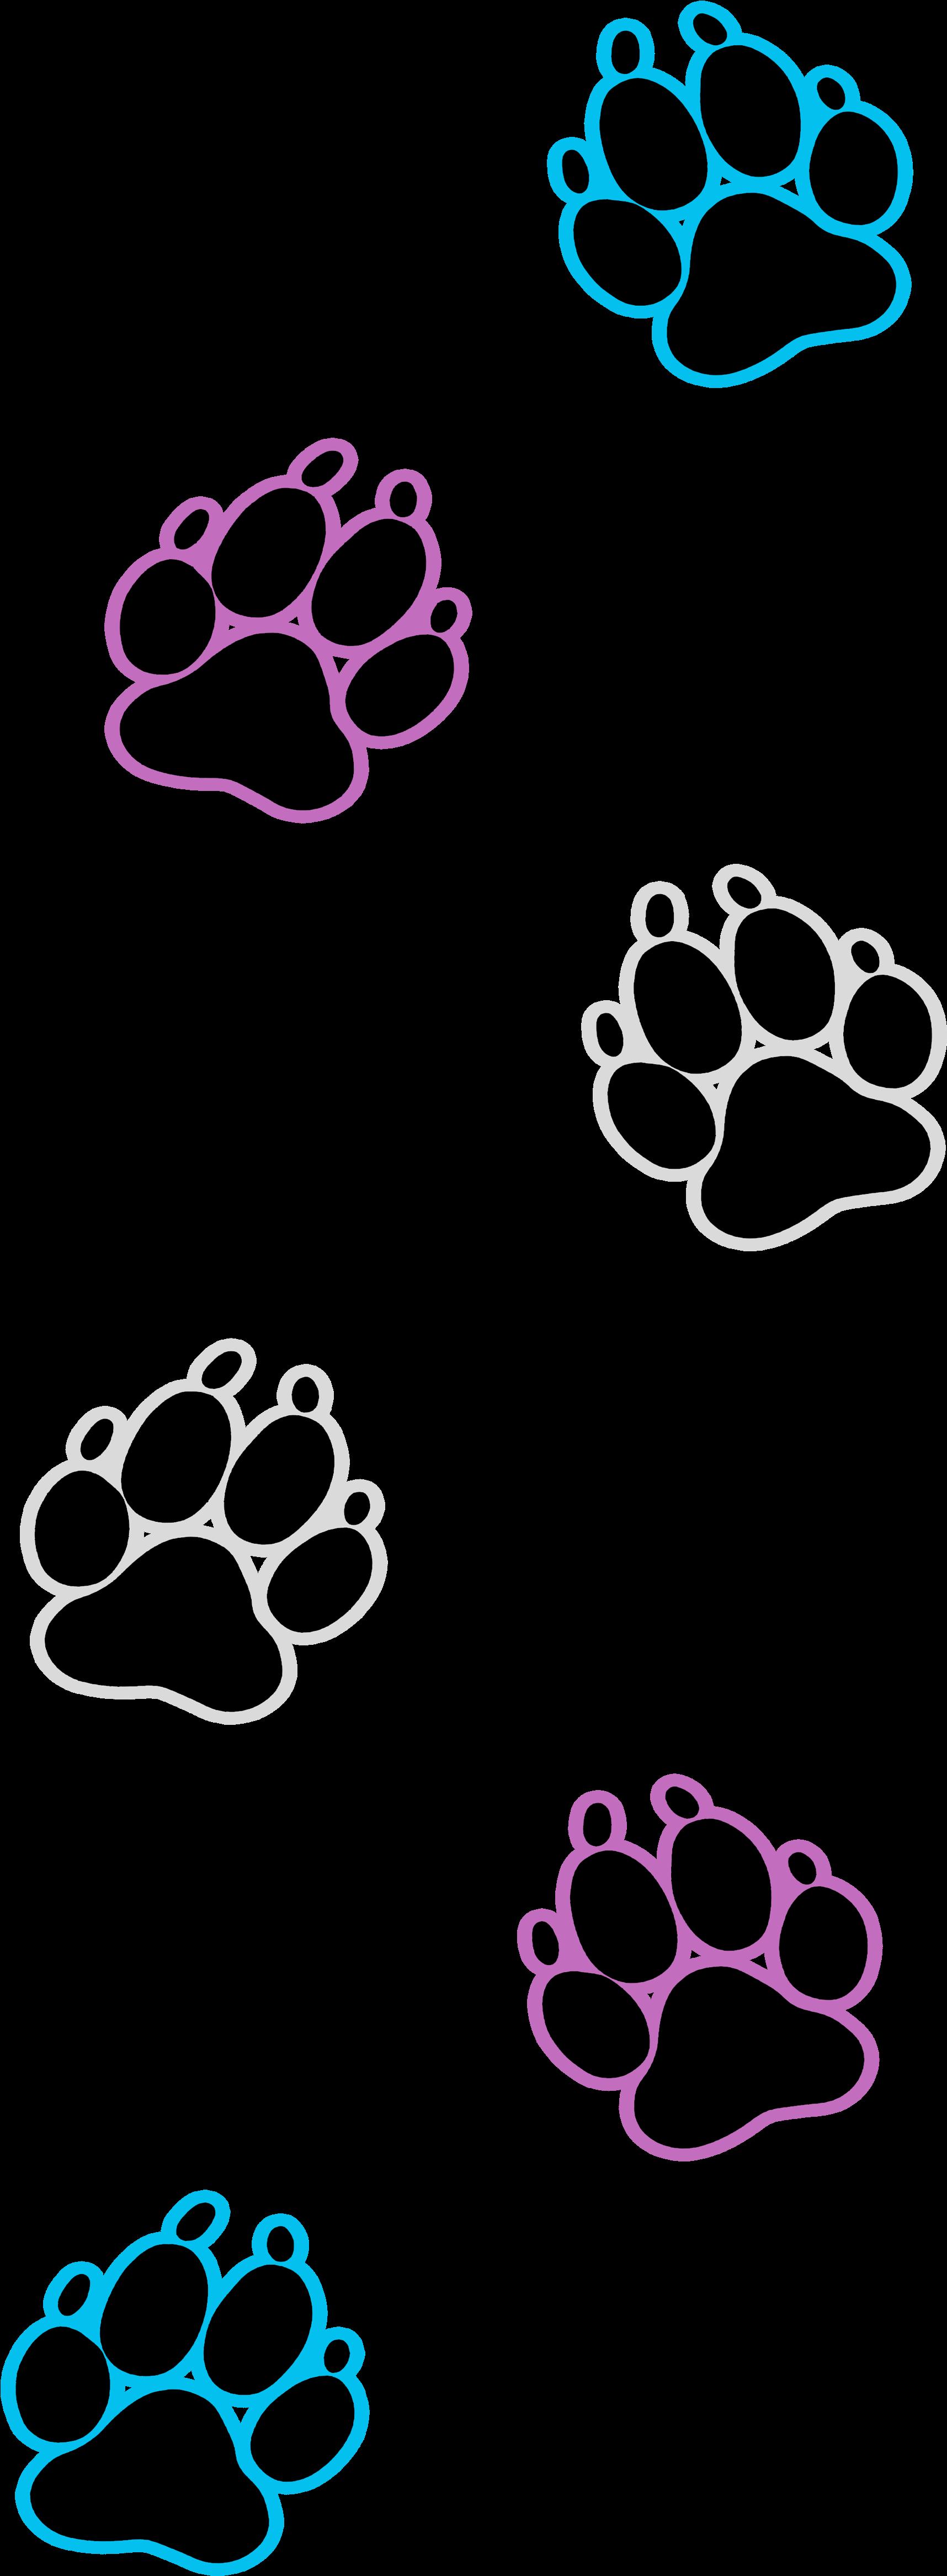 Dog Paw Print Trans Transparent Dog Paw Print Background Transparent Cartoon Jing Fm 173 transparent png illustrations and cipart matching paw print. dog paw print trans transparent dog